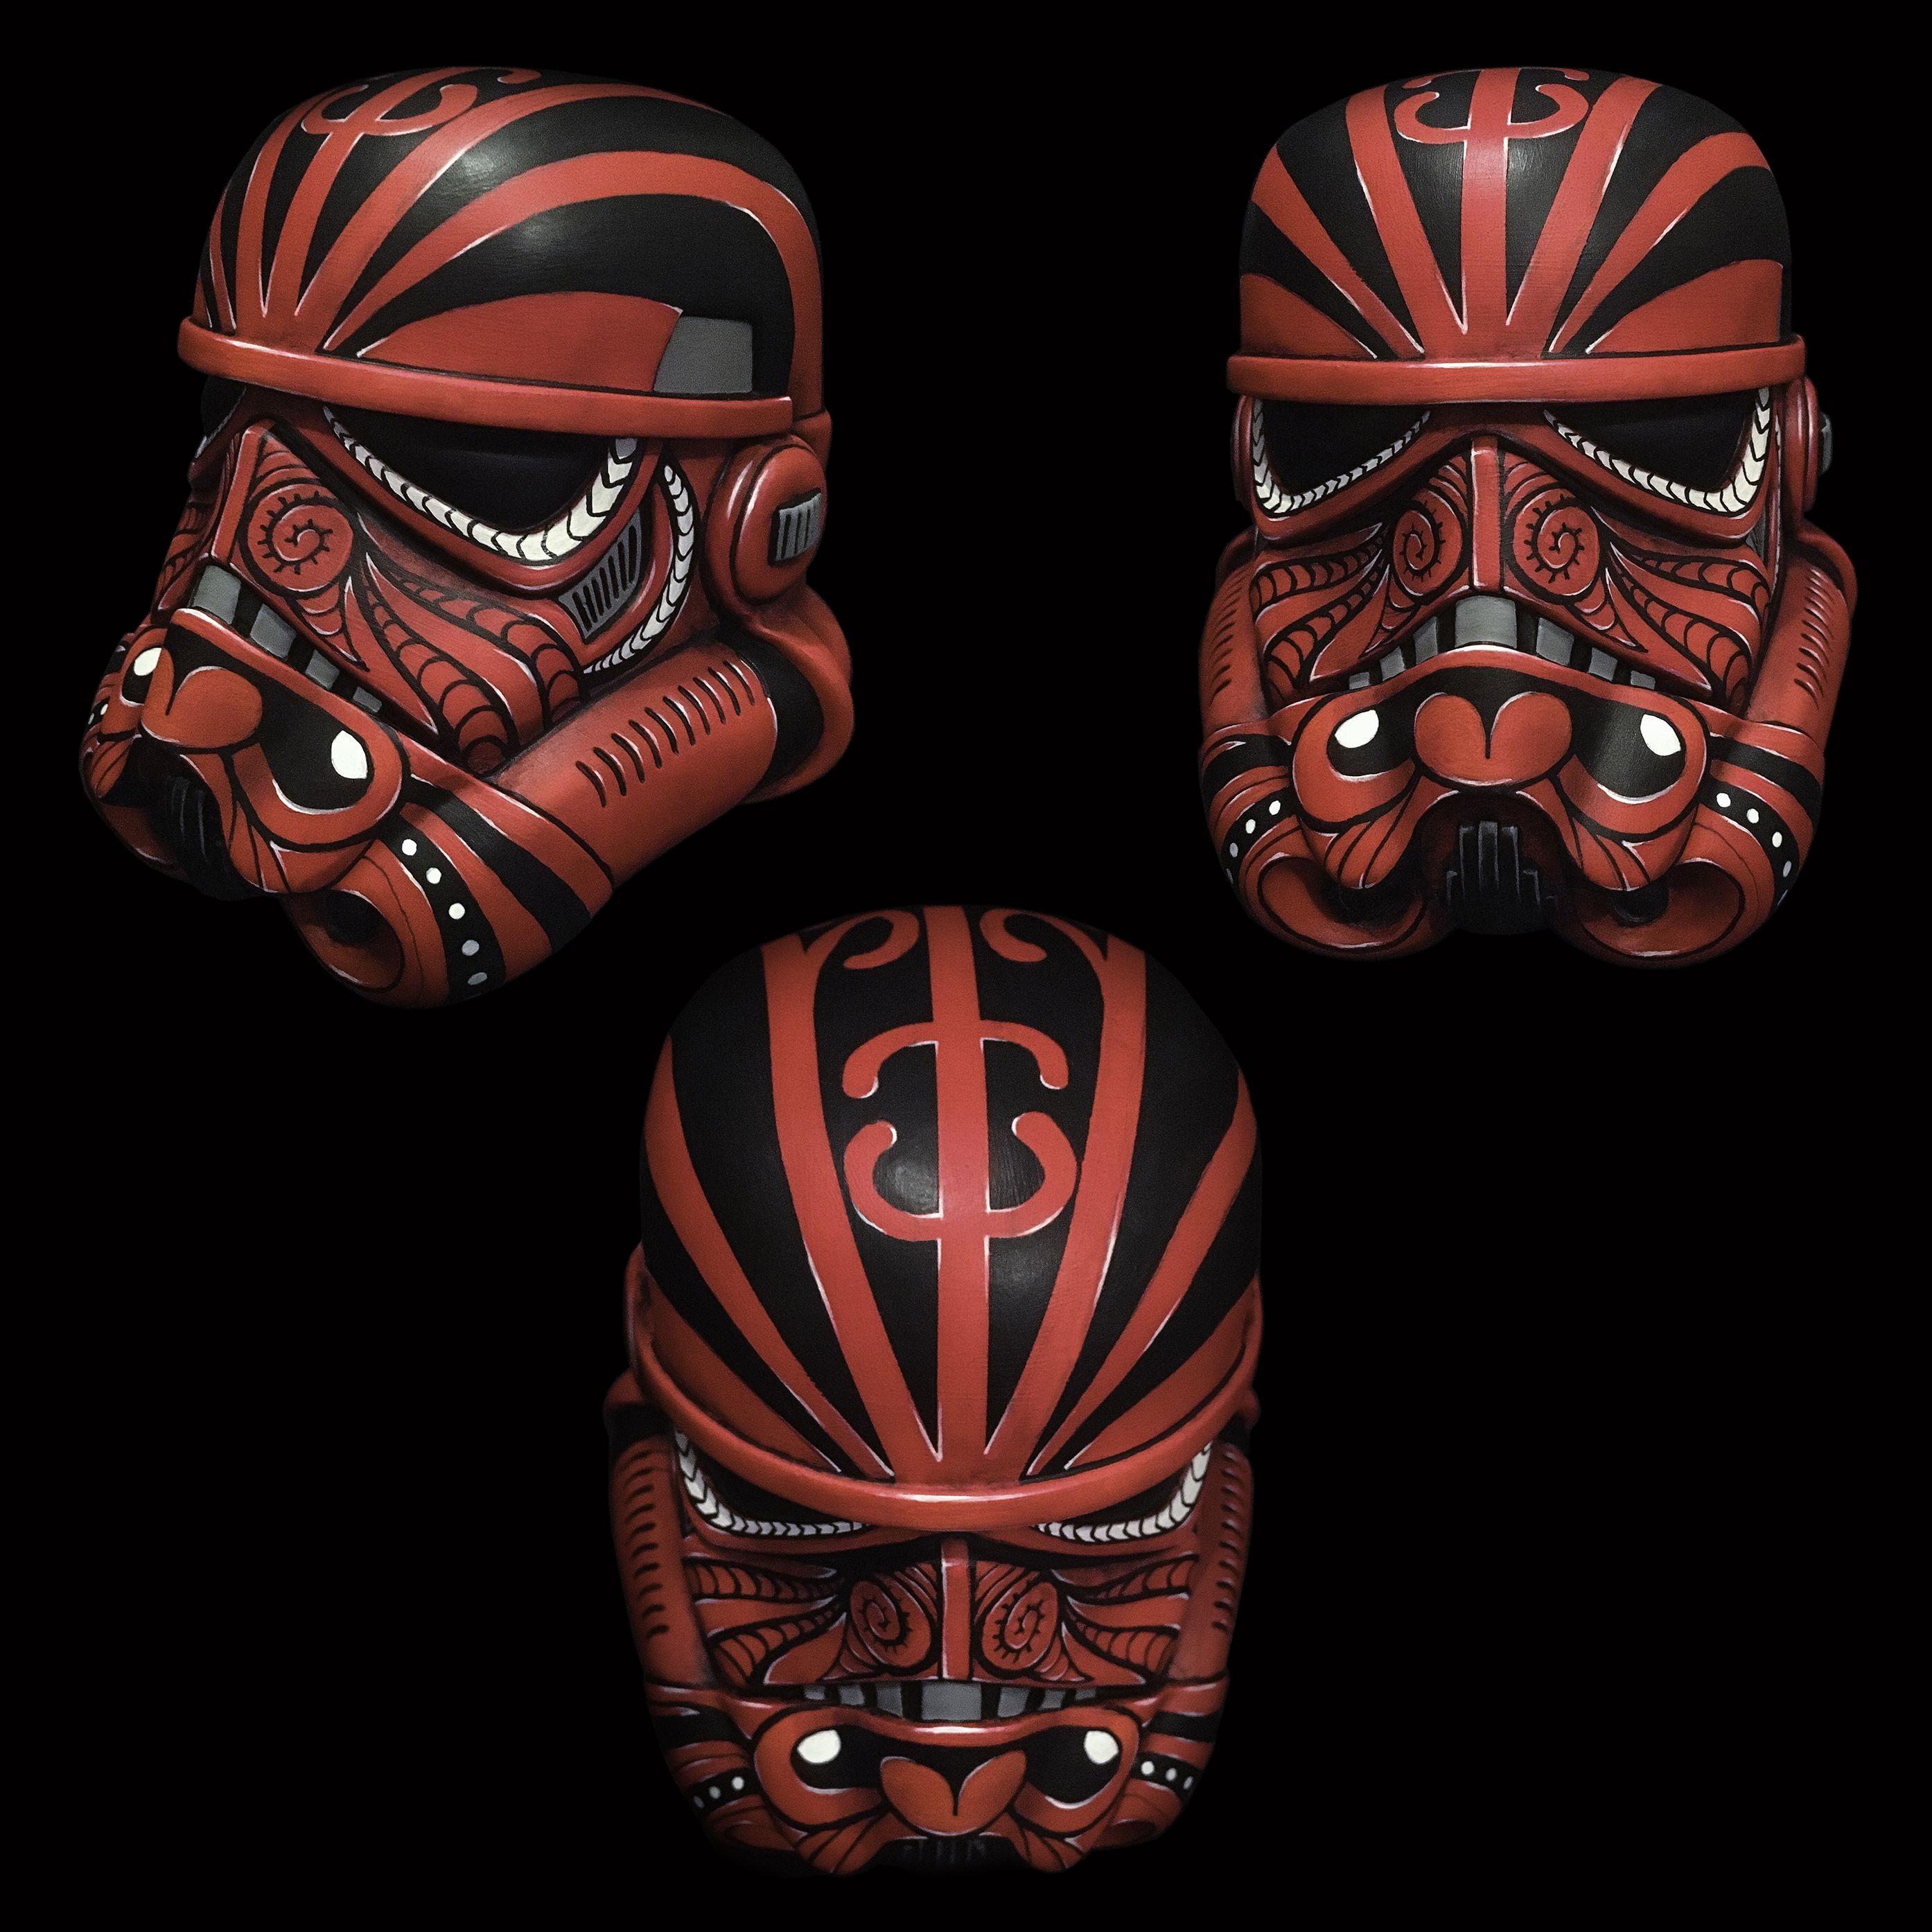 Stormtrooper Helmet Papercraft Star Wars Stormtrooper Helmet Moko Maori Tattoo Mokotrooper